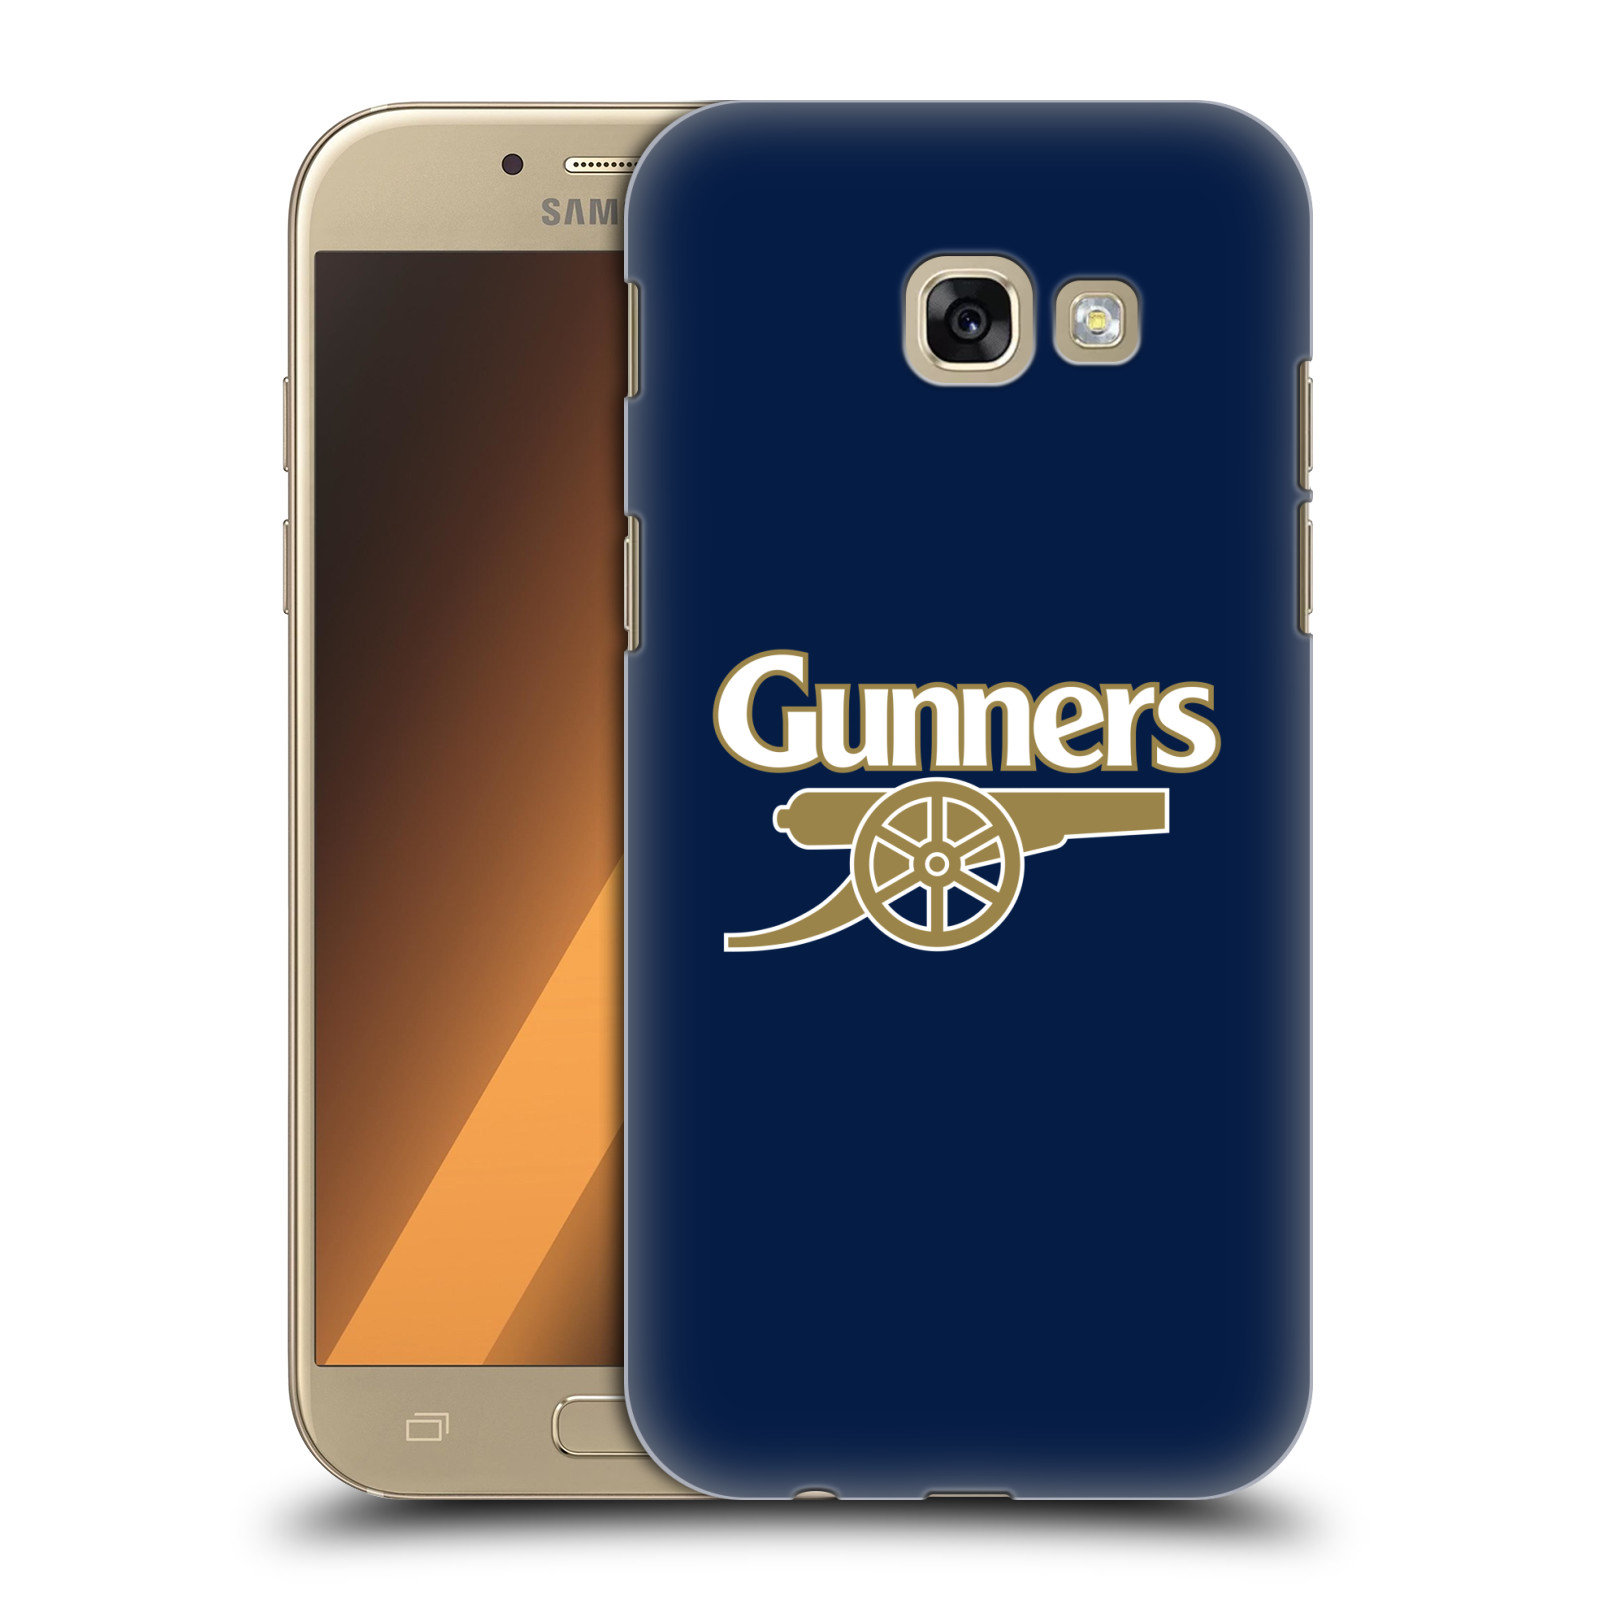 Plastové pouzdro na mobil Samsung Galaxy A5 (2017) - Head Case - Arsenal FC - Gunners